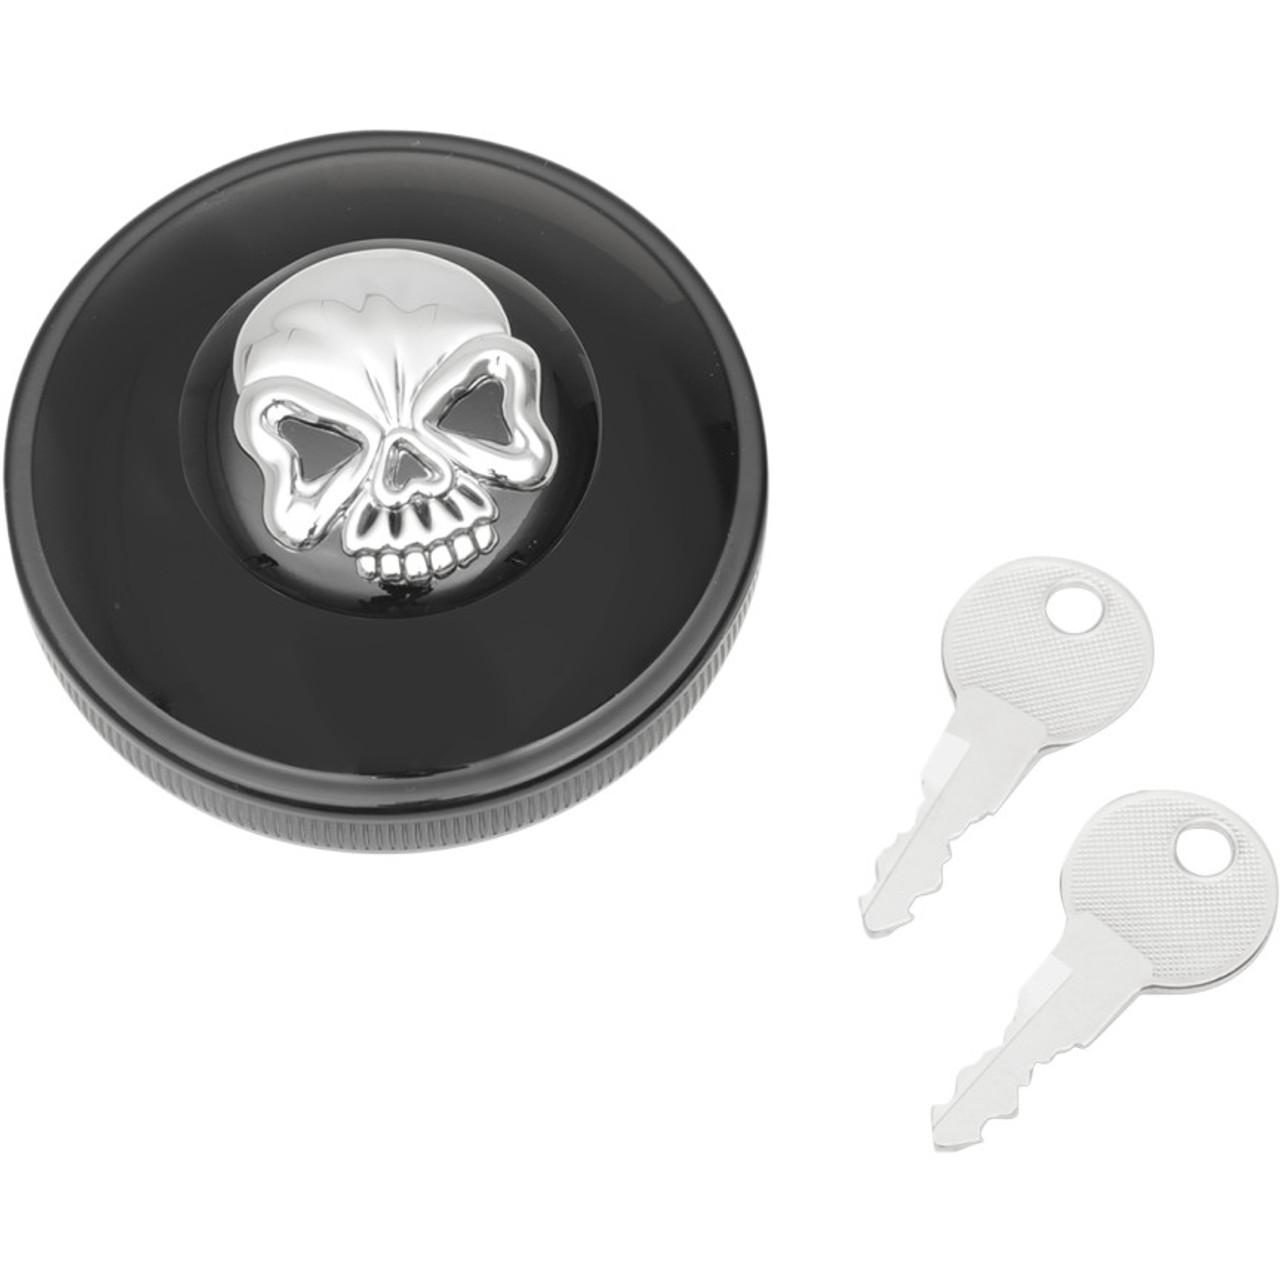 Specialties: Drag Specialties Screw-In Locking Skull Gas Caps For